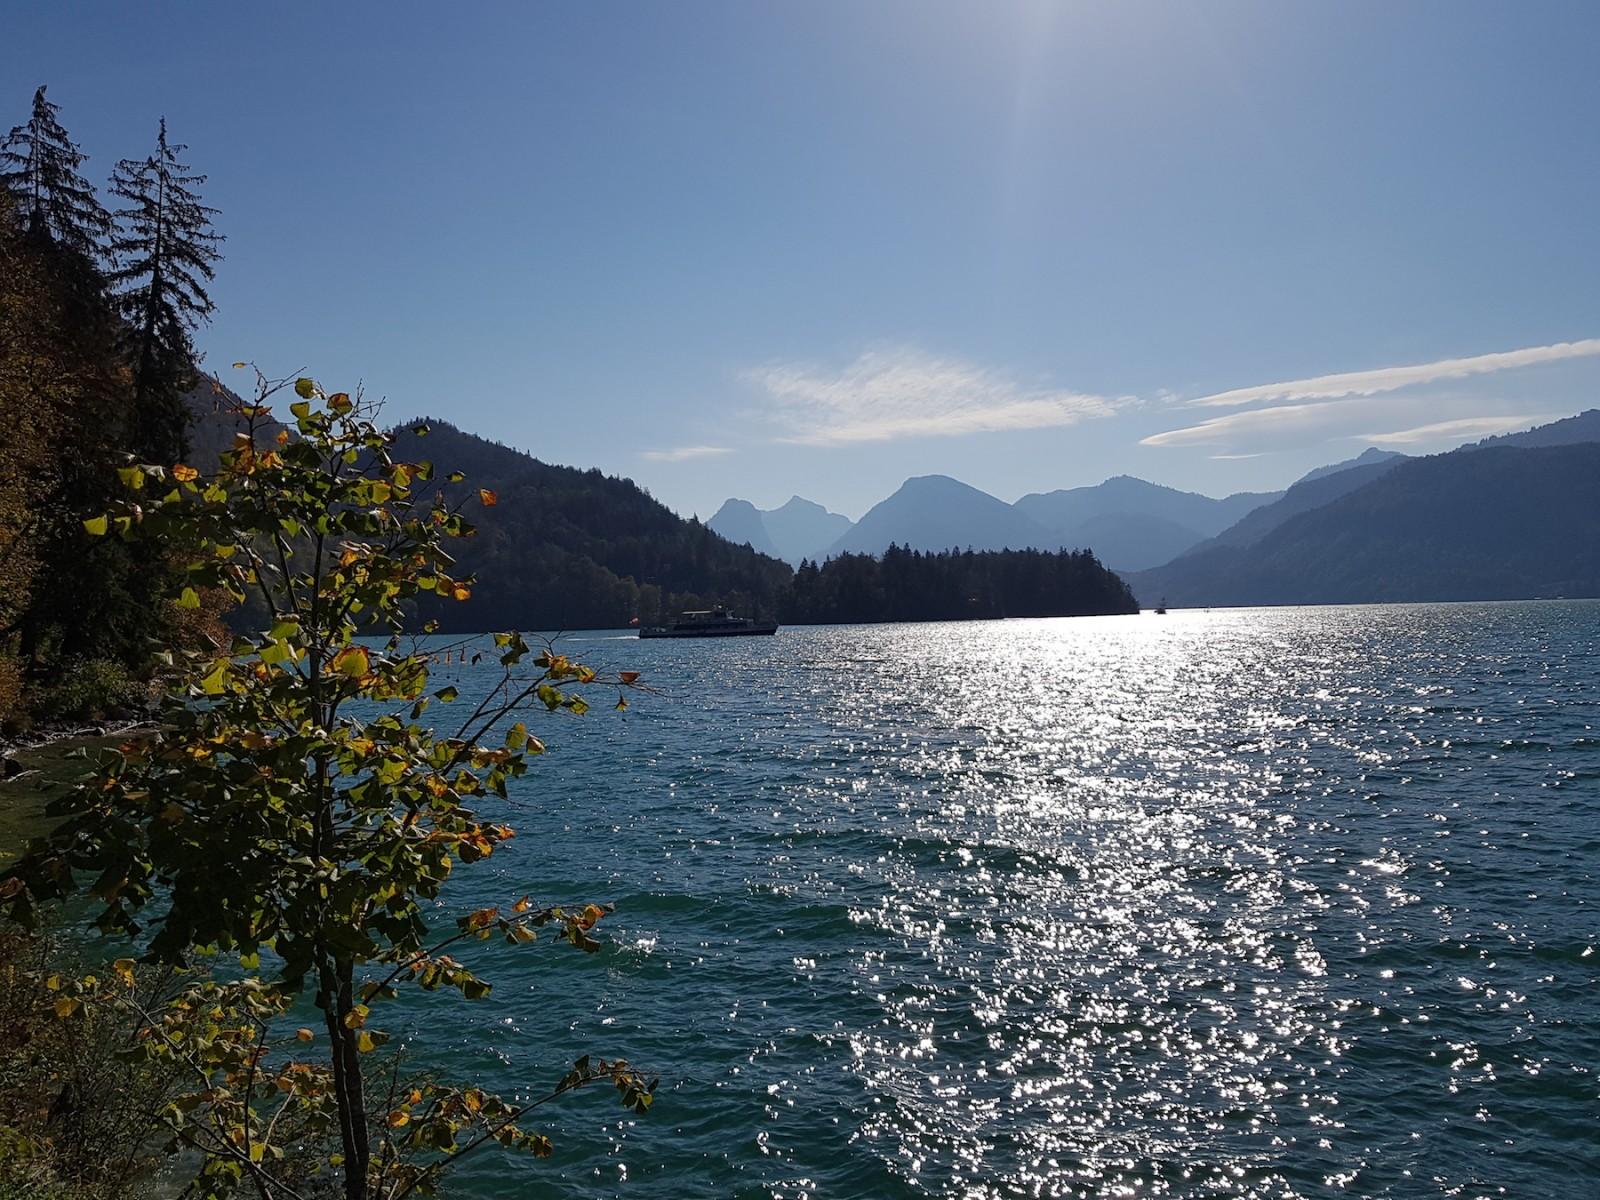 ... entlang des Sees geht es Richtung Gasthof Fürberg...